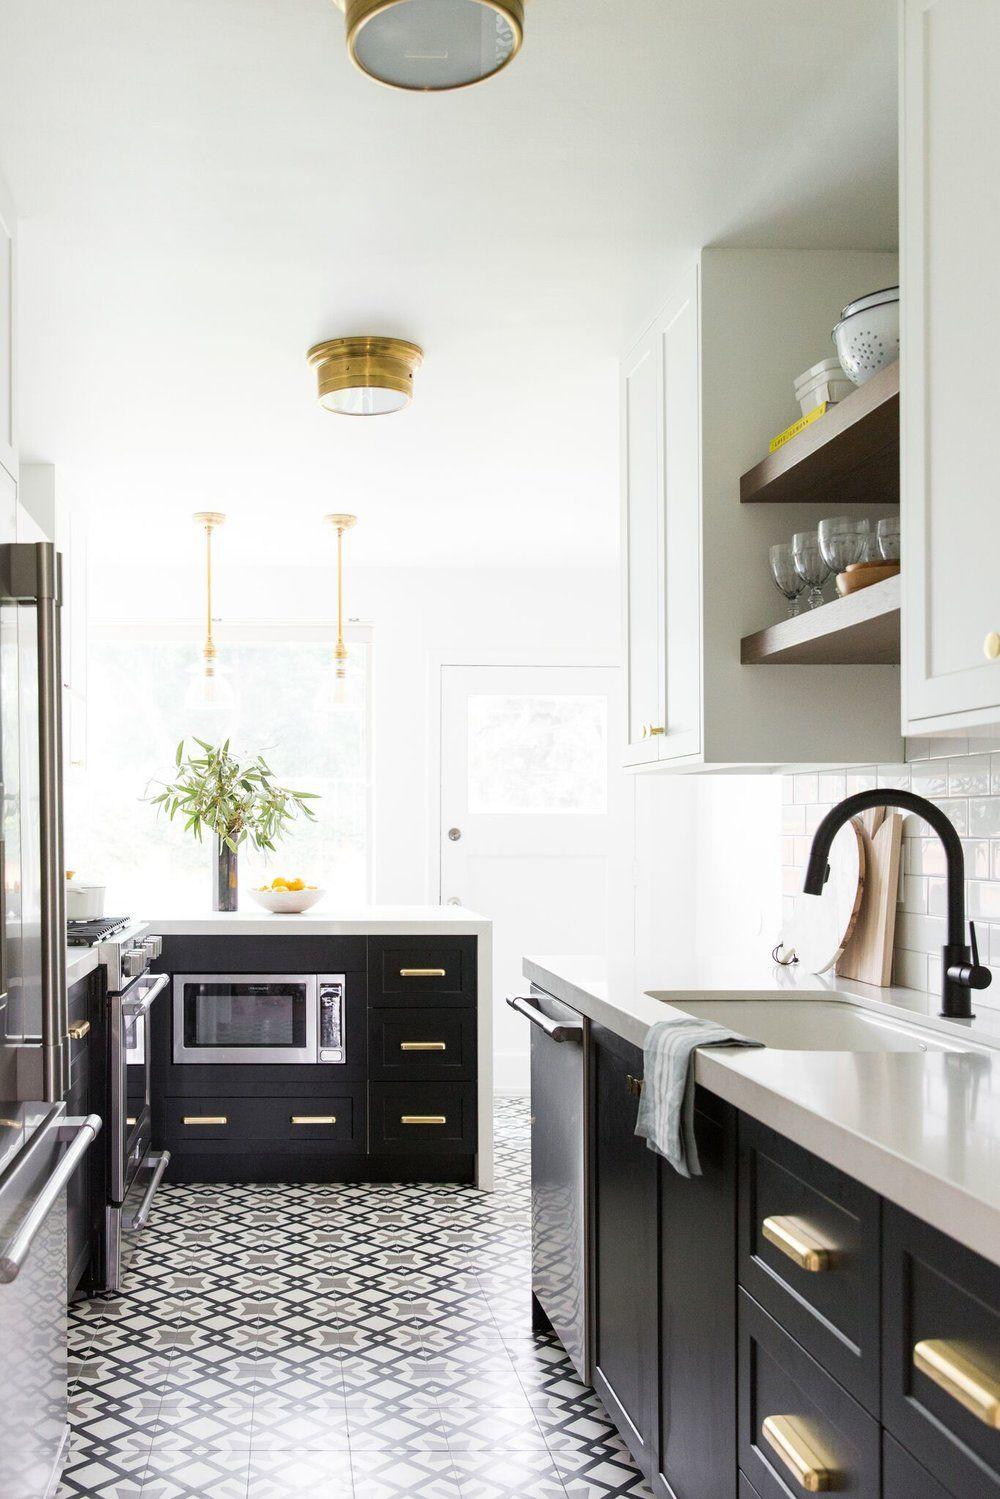 Hillside Kitchen Remodel Reveal | Studio mcgee, Studio and Kitchens